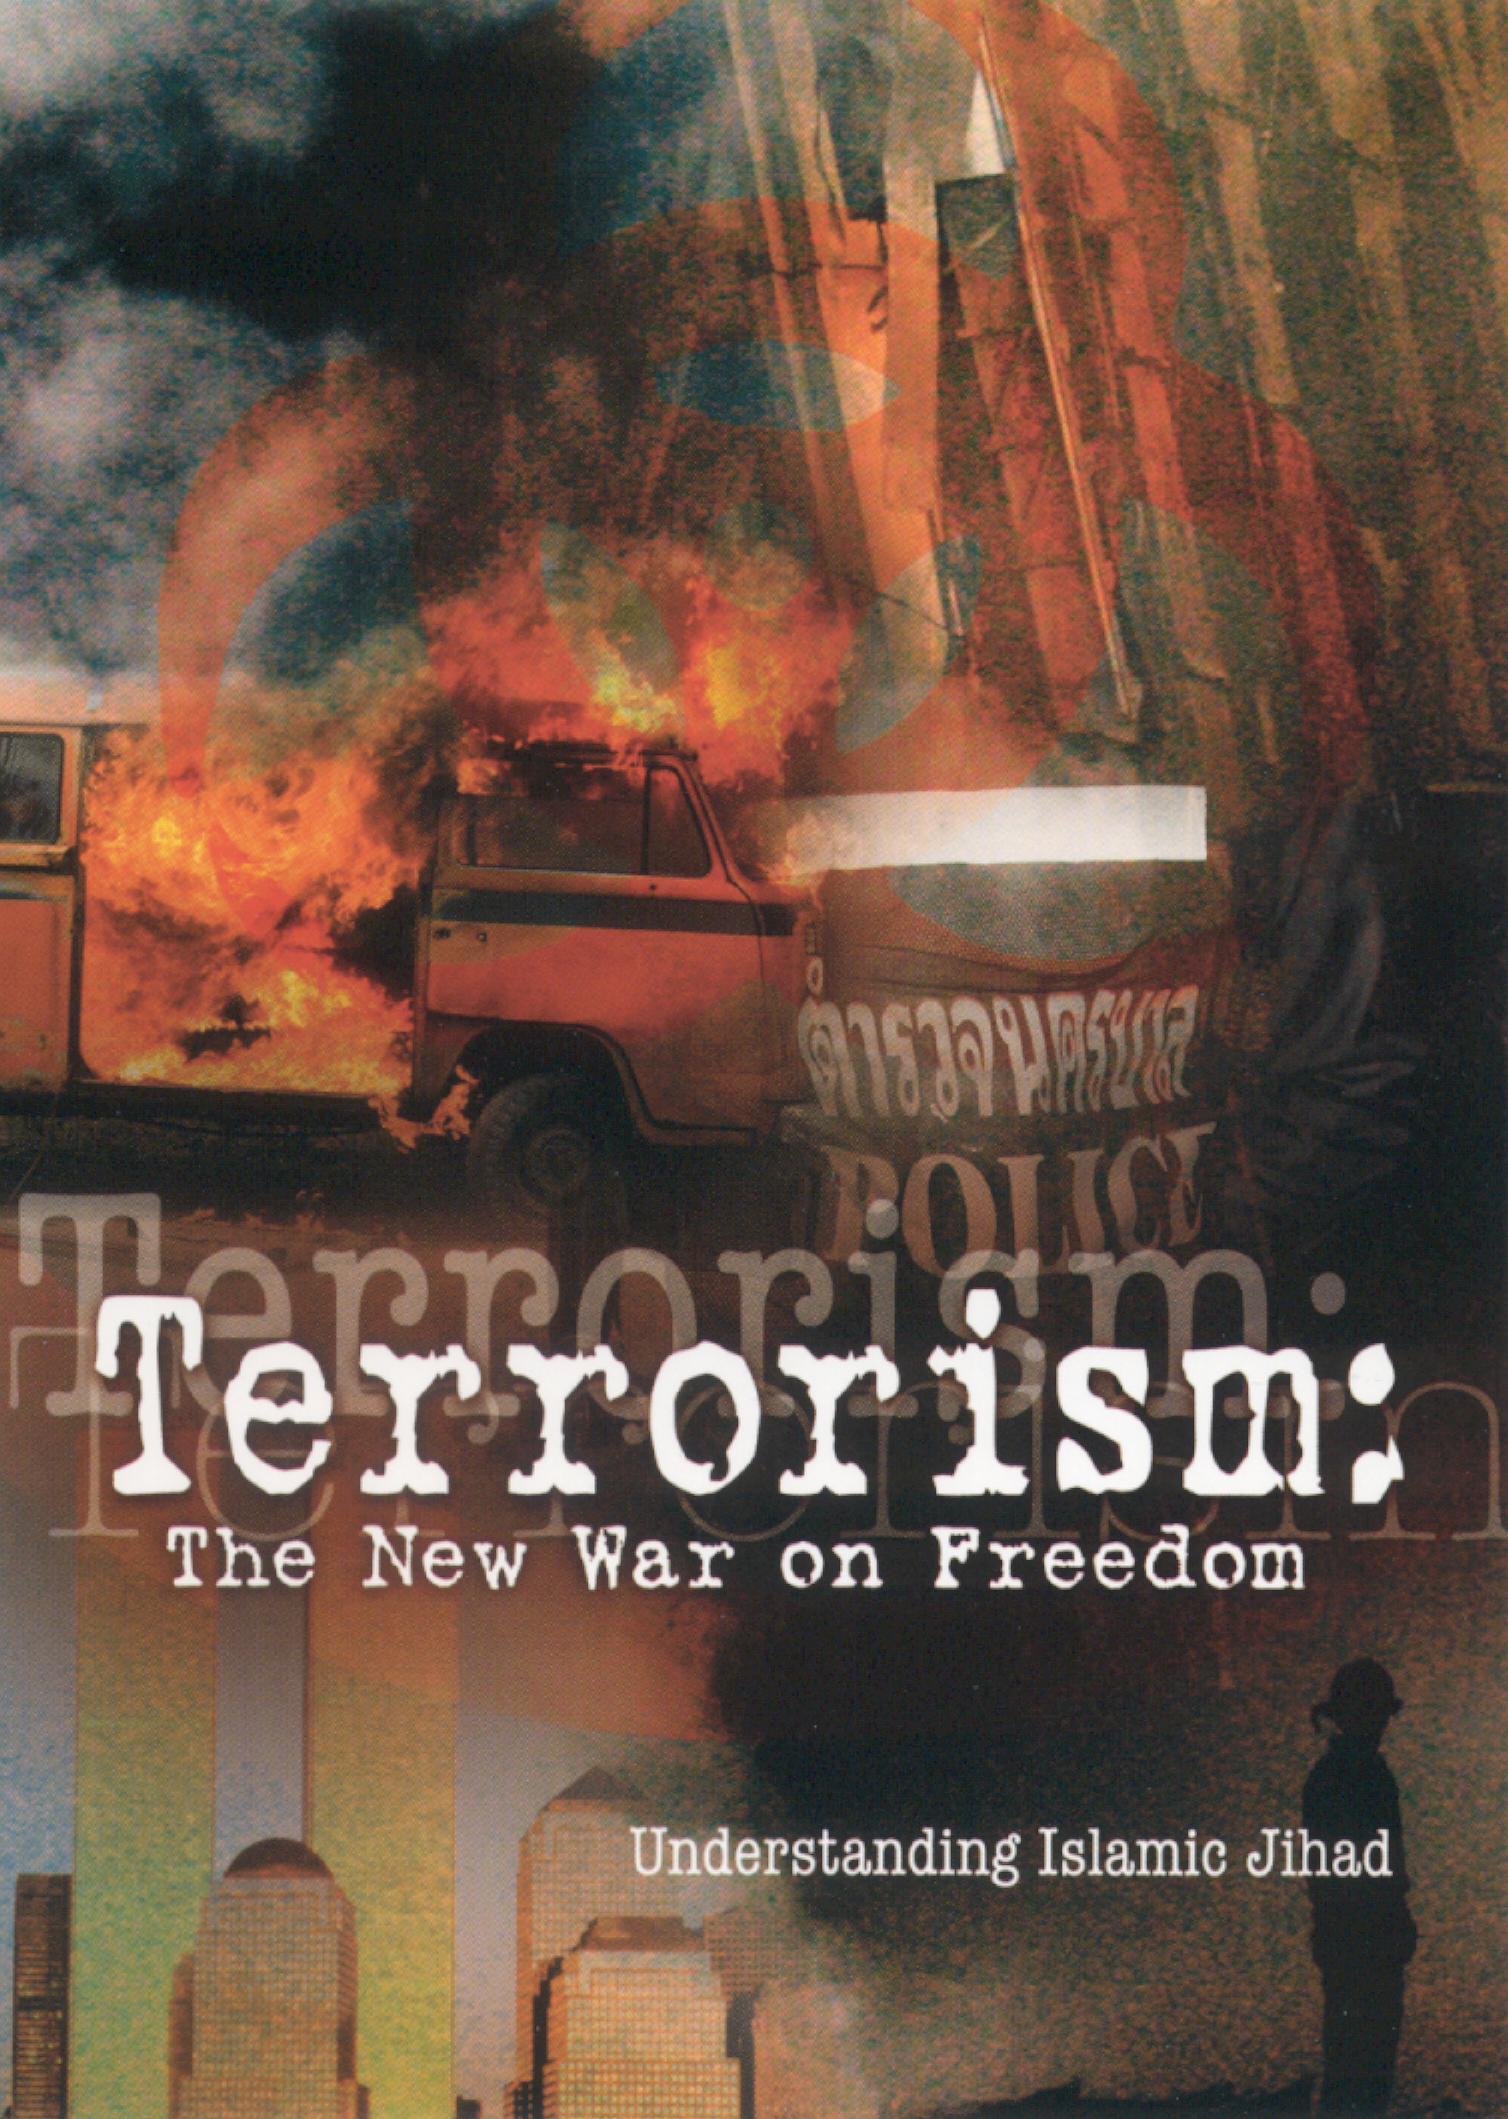 Terrorism: The New War on Freedom